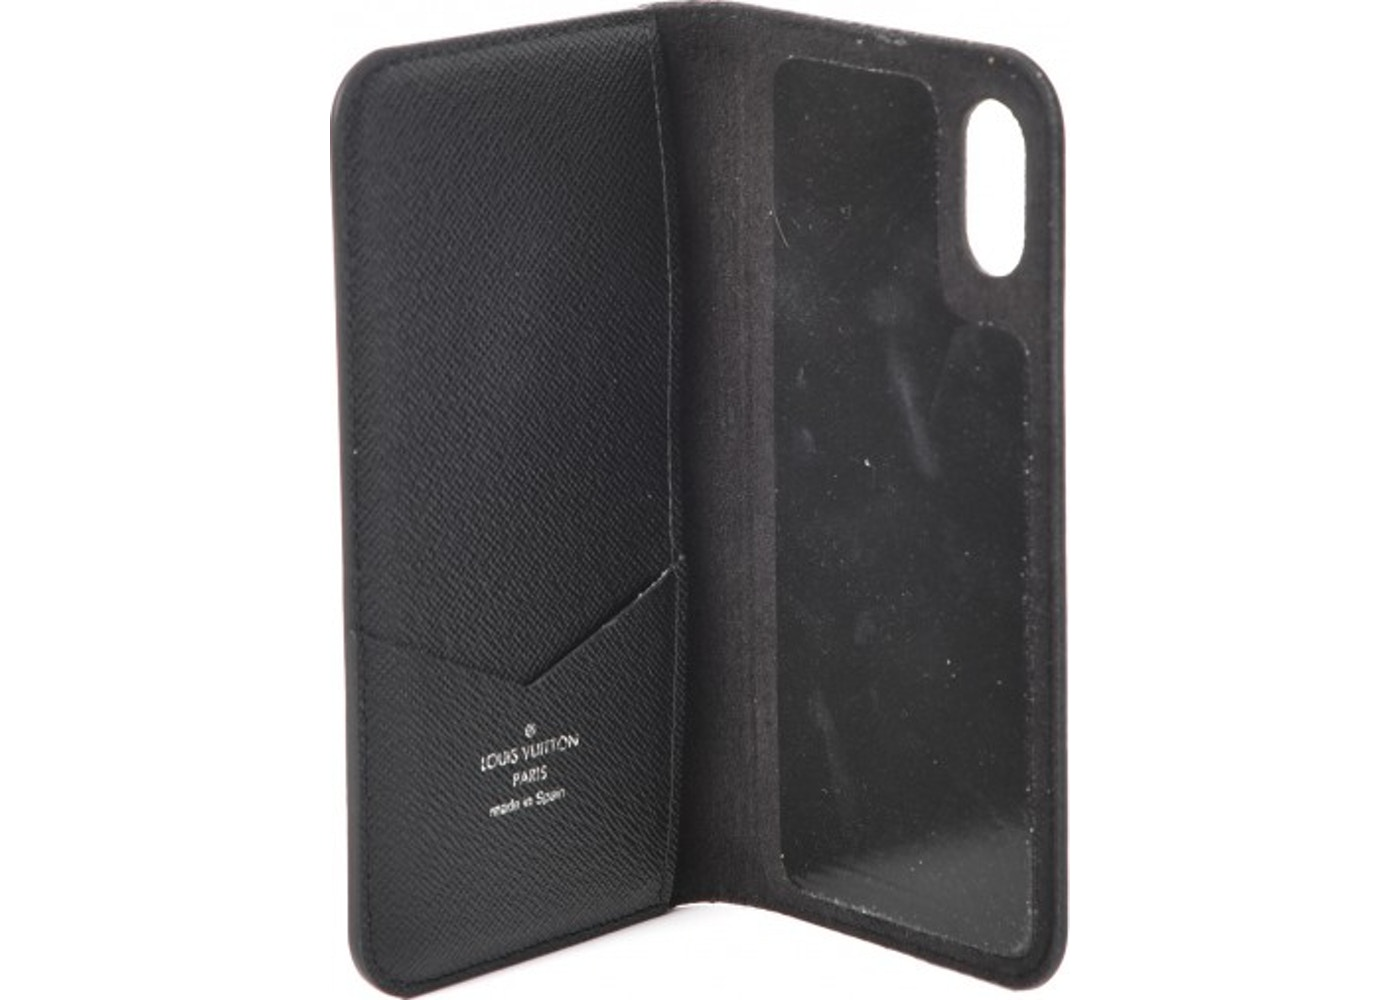 sale retailer f0a9c c96fa Louis Vuitton Folio Case iPhone X Monogram Eclipse Gray/Black